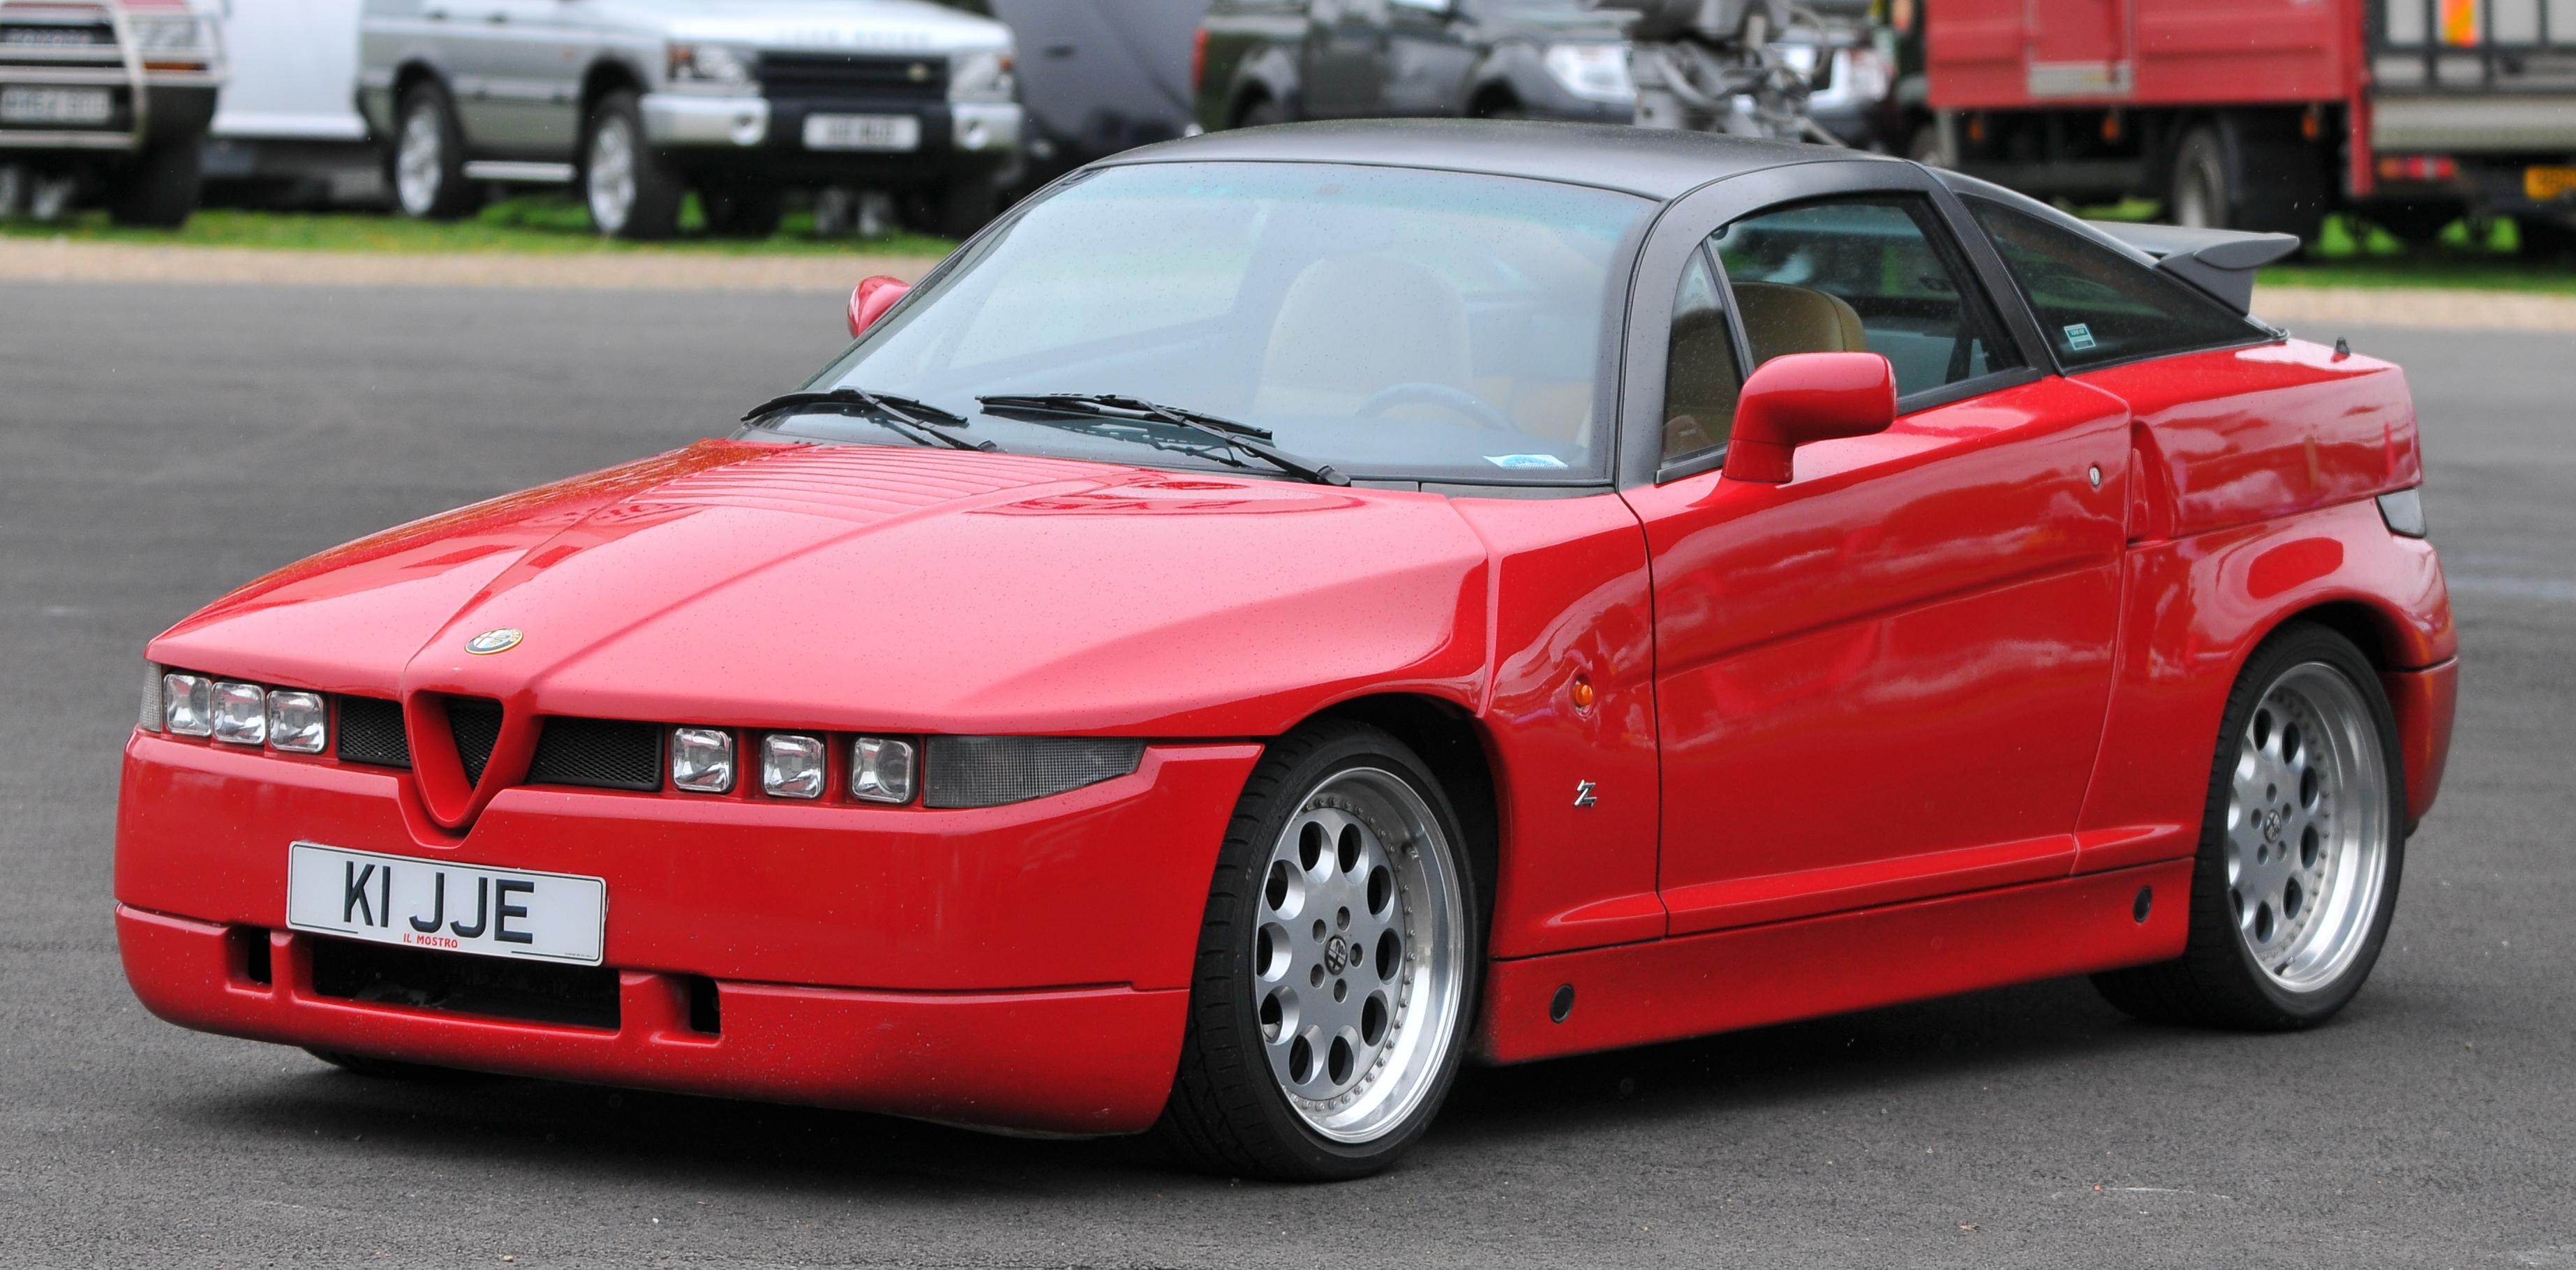 1986 Alfa Romeo Spider Graduate Review  thetruthaboutcarscom